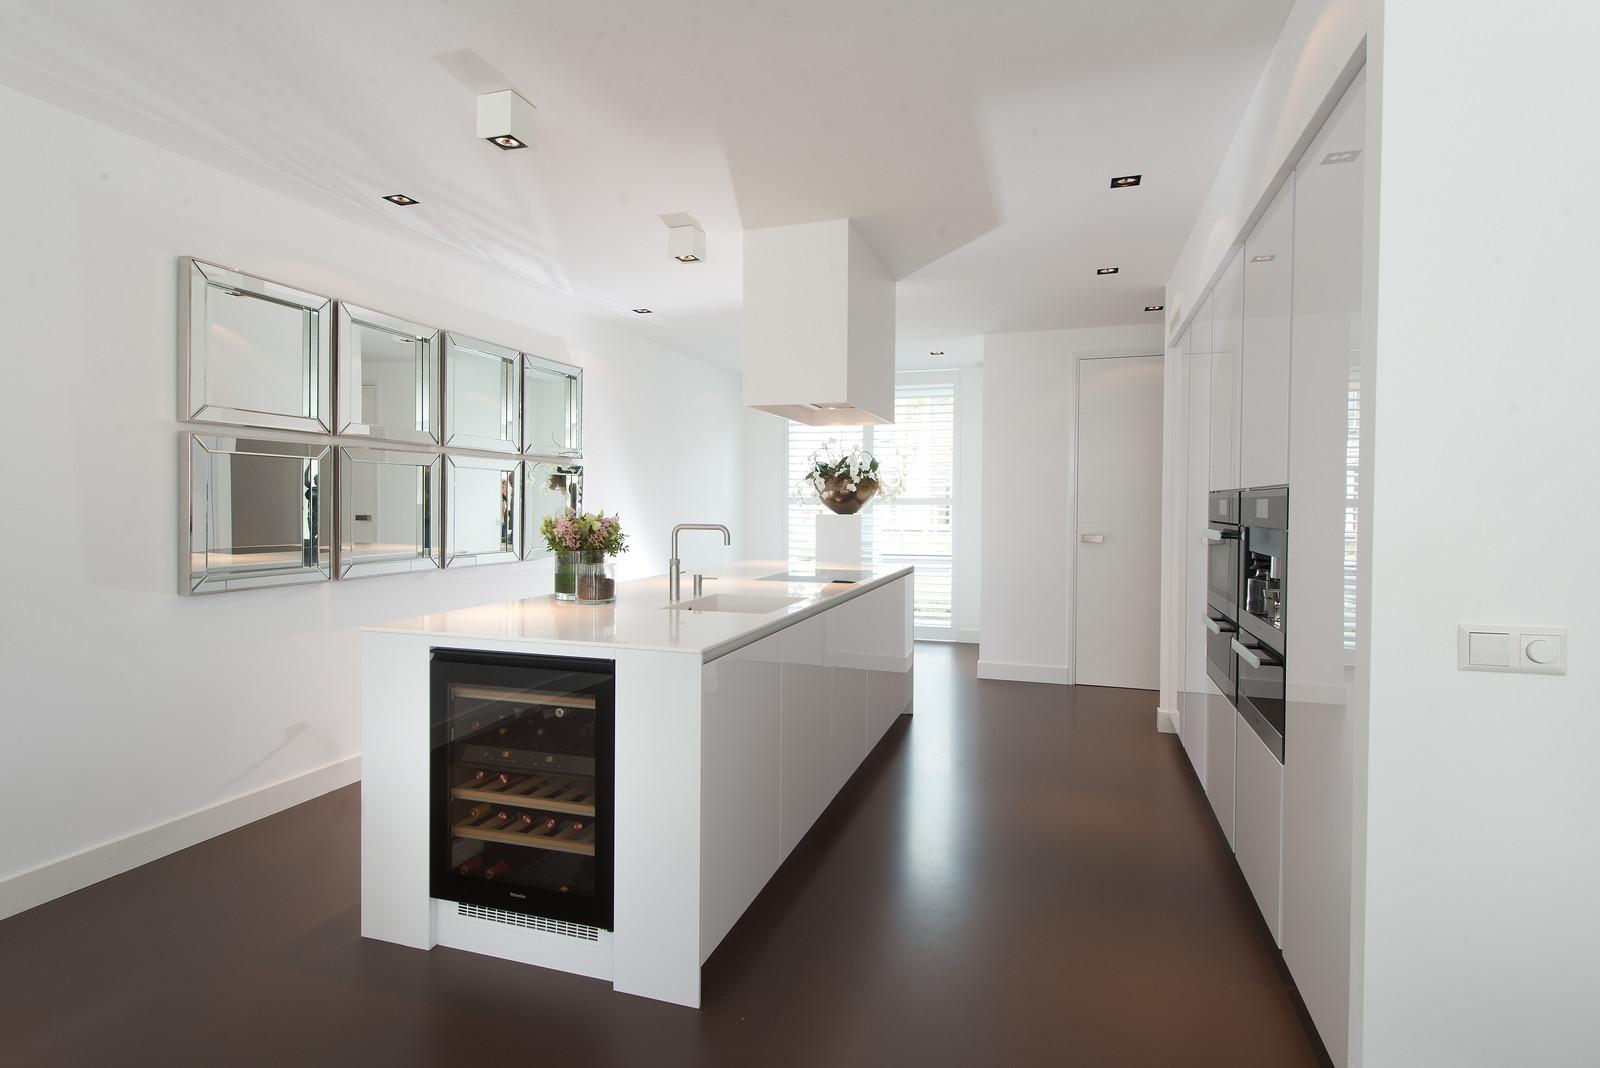 Strakke Witte Keuken In Oisterwijk : Design keuken nieuws startpagina ...